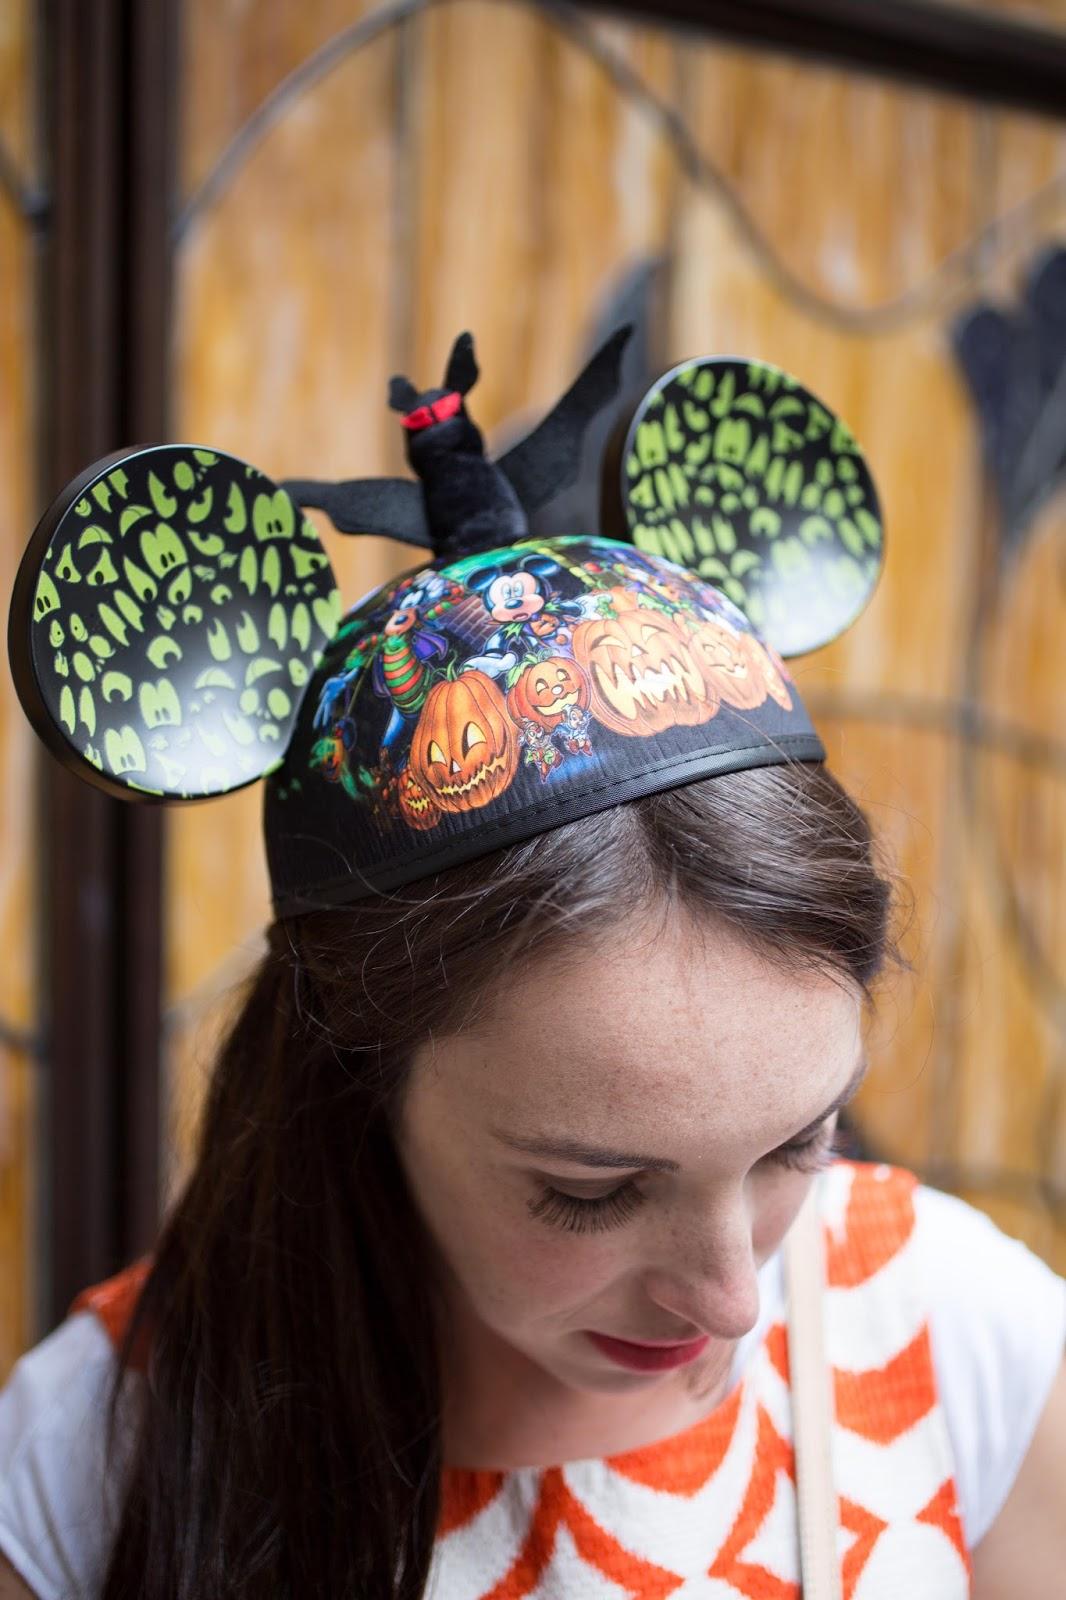 disneyland mickey halloween party 2017